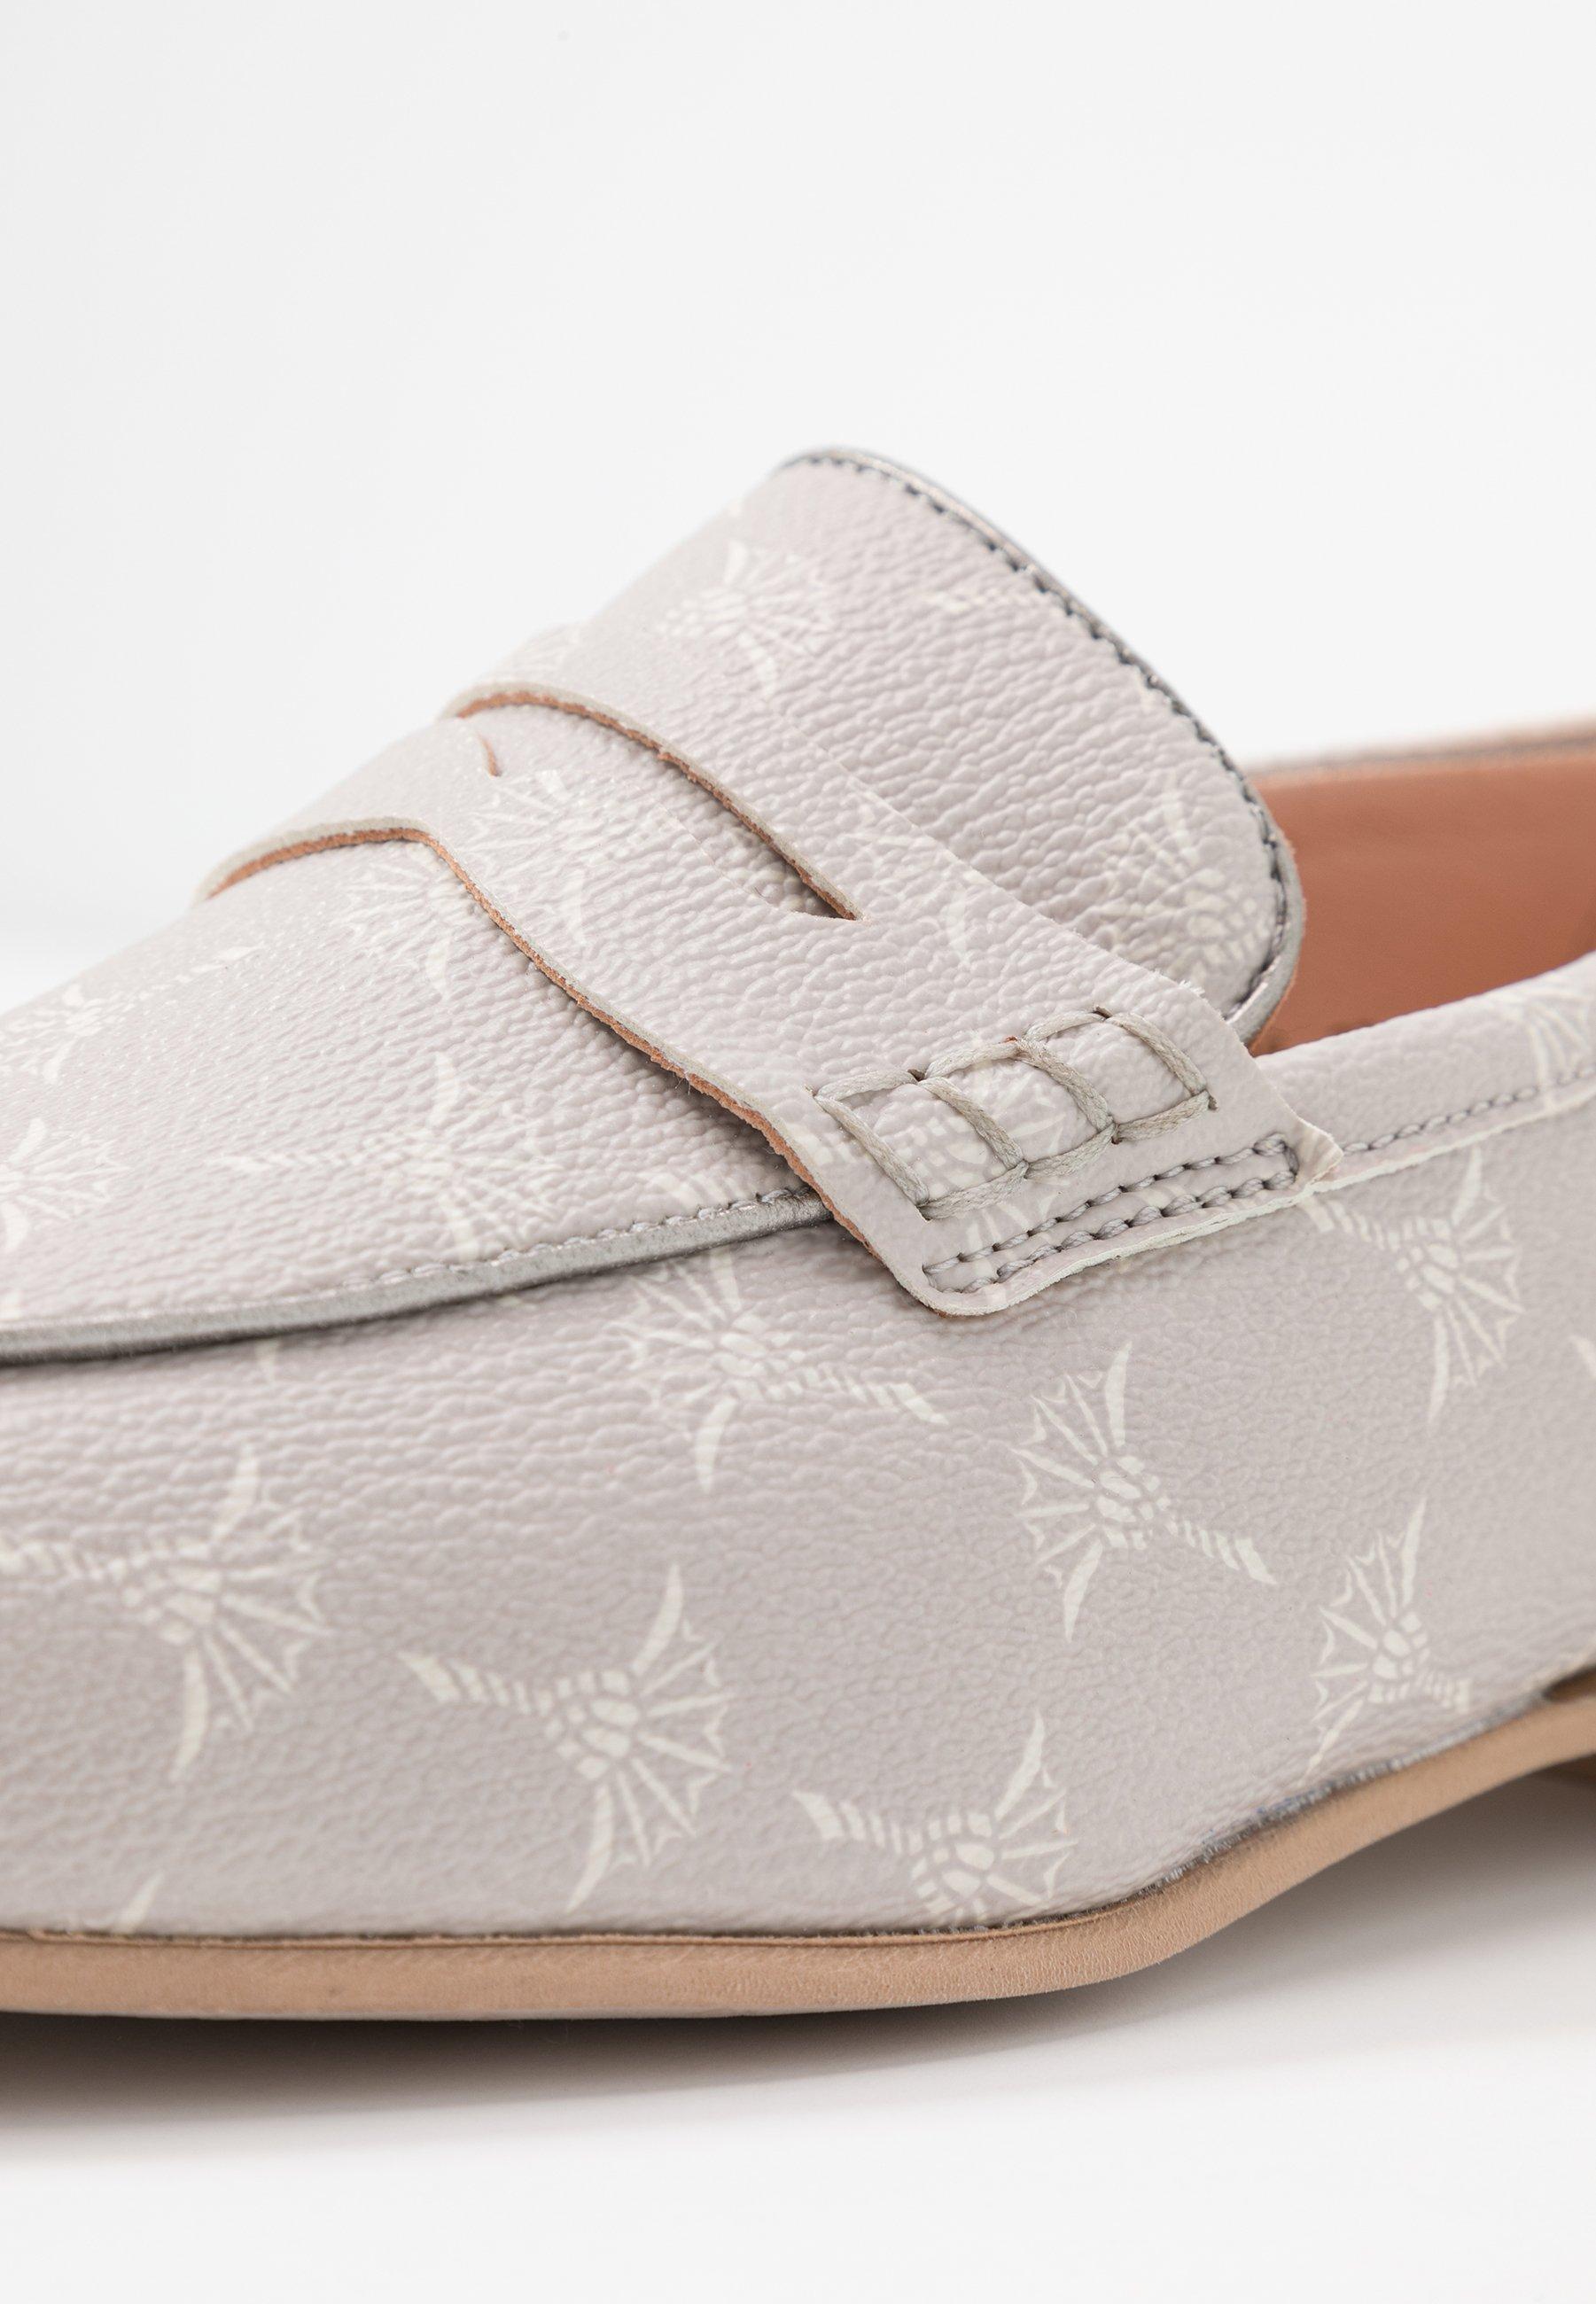 JOOP! CORTINA FILIPPA - Loafers - light grey